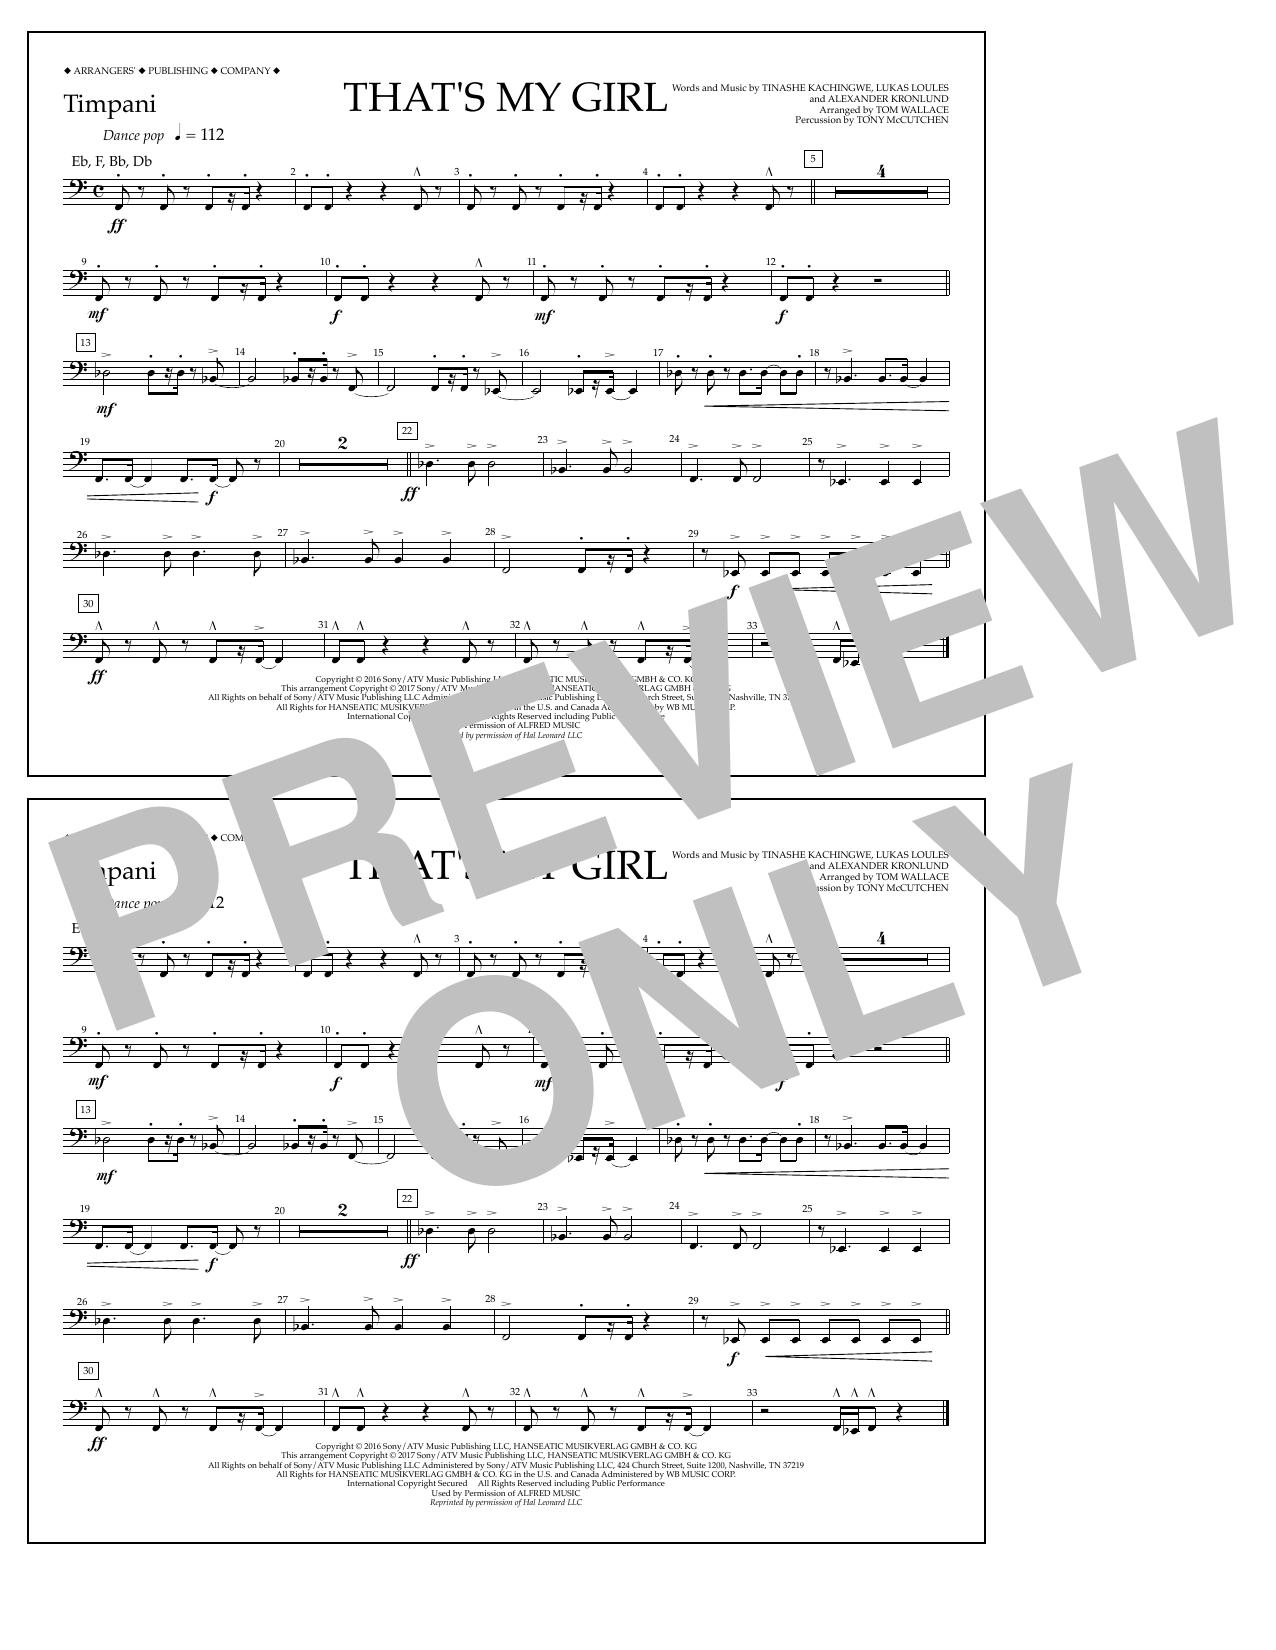 That's My Girl - Timpani Sheet Music